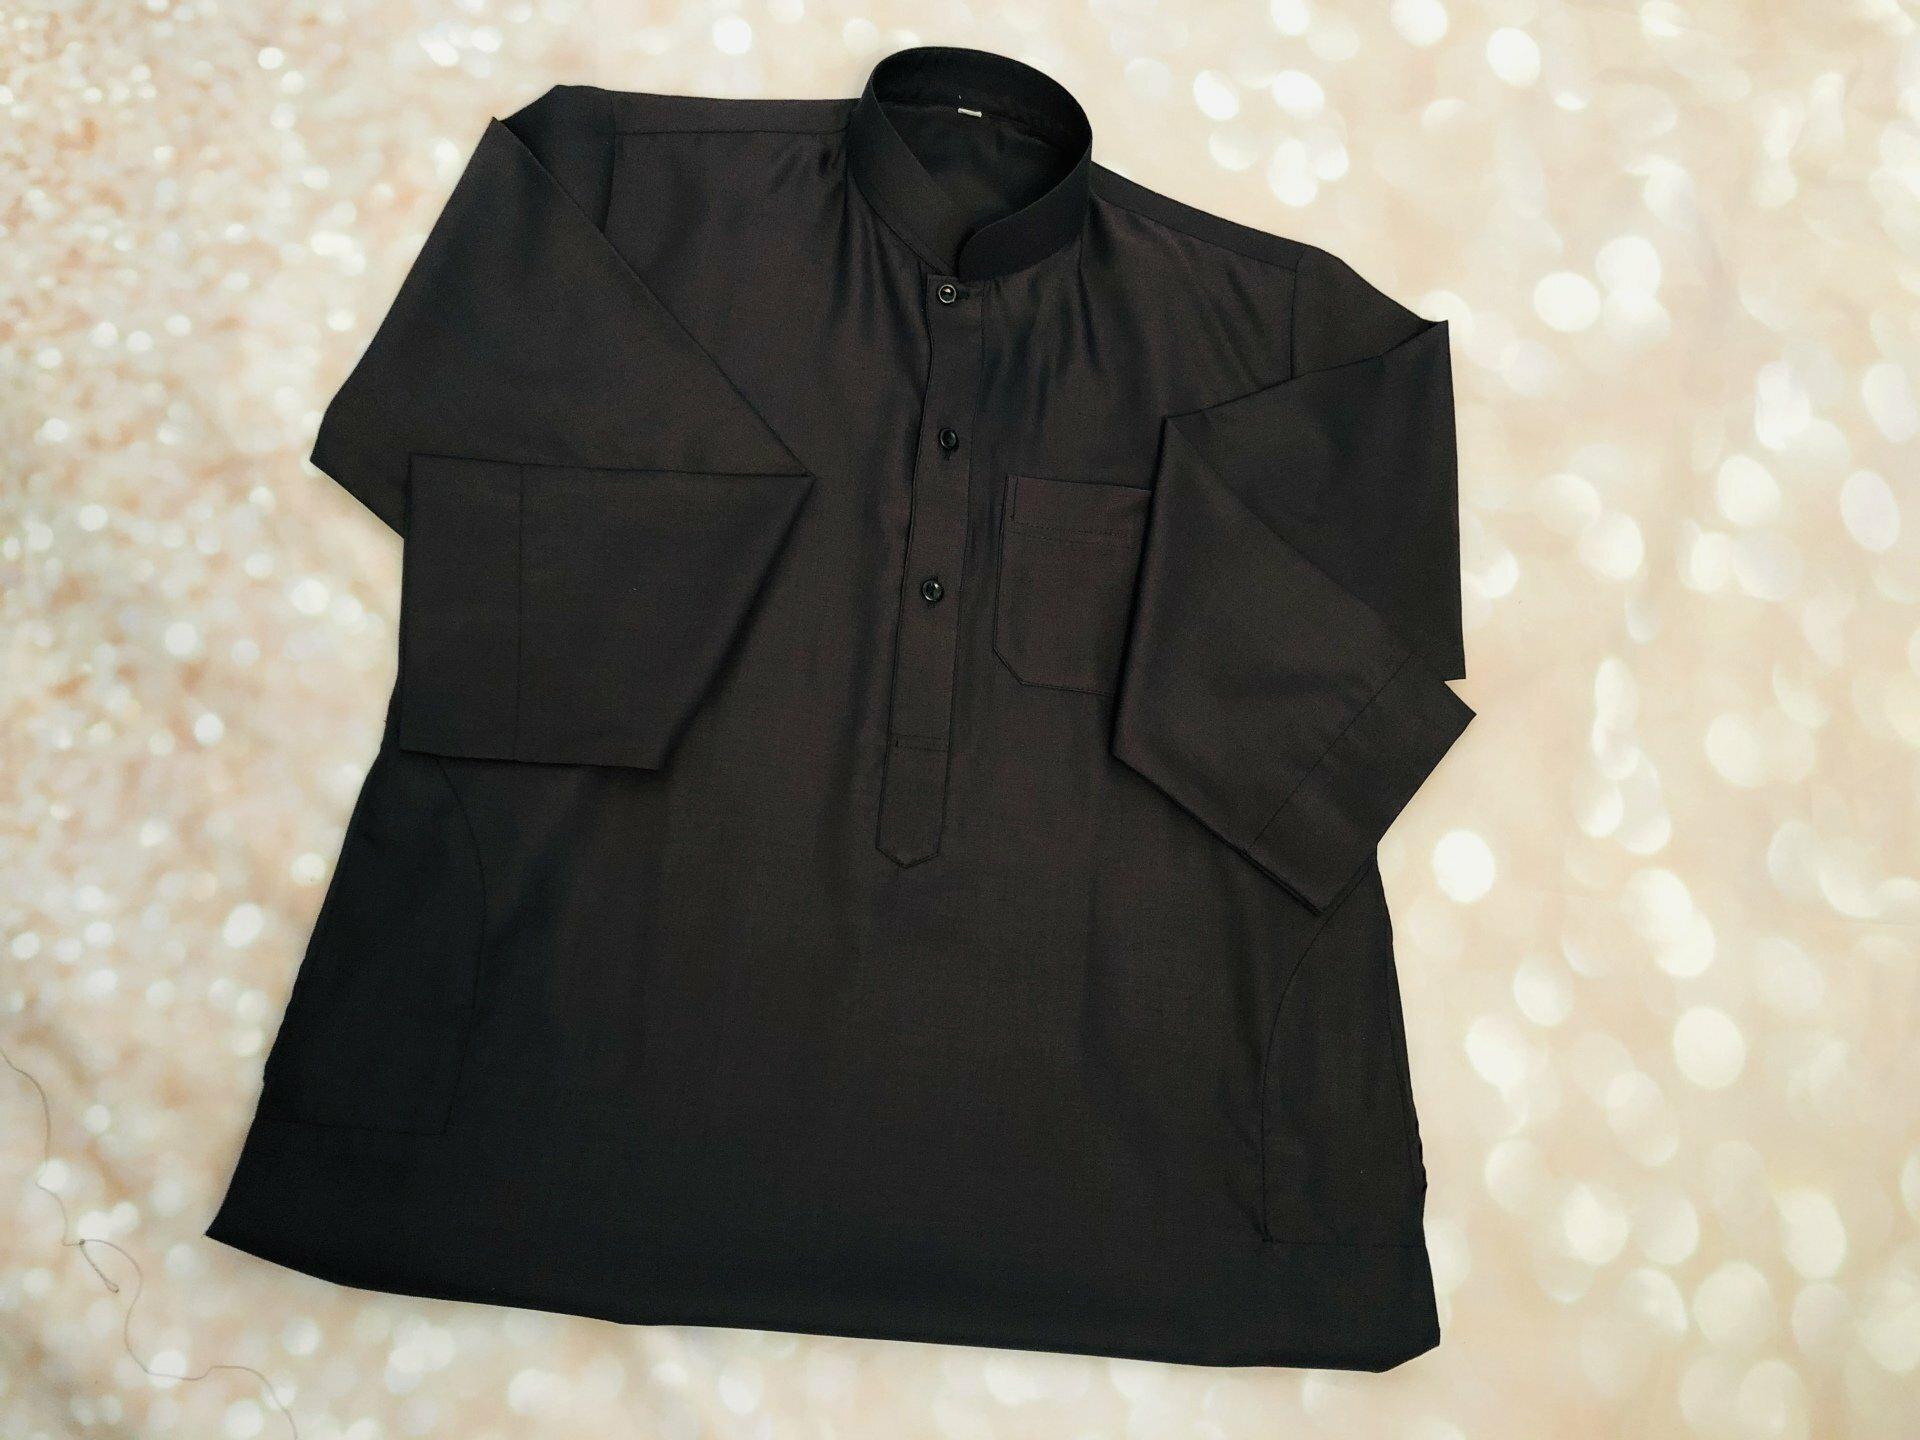 Khamis Track Long Sleeve T-shirt